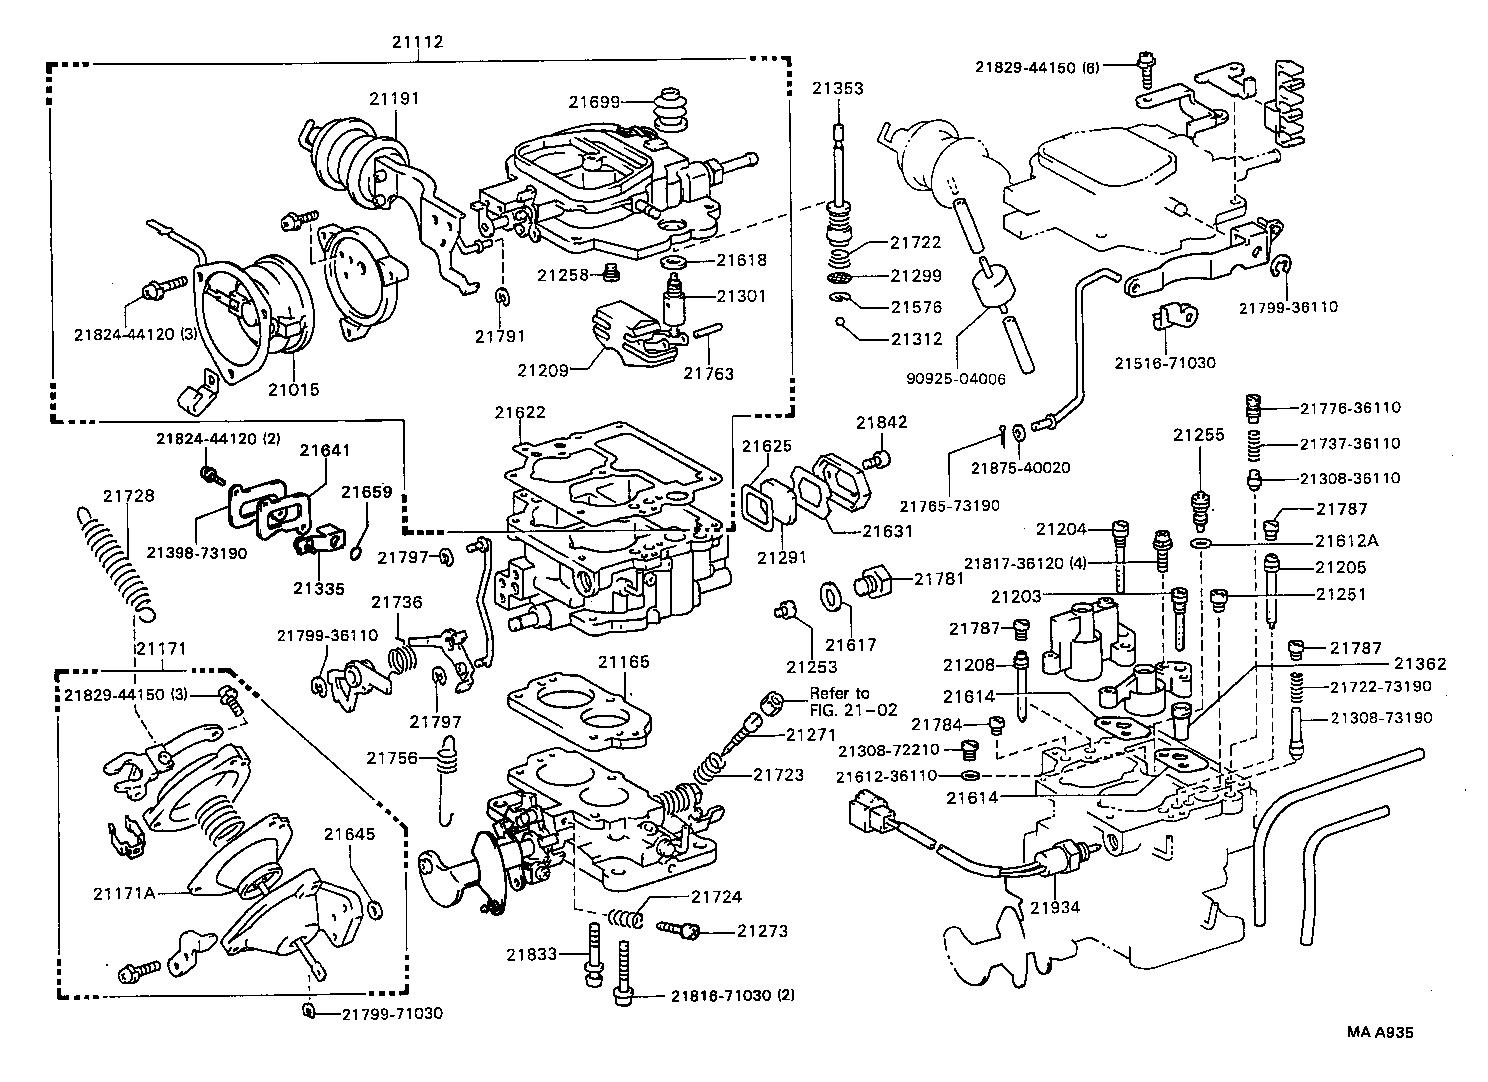 Kia Sorento Fuse Box Diagram